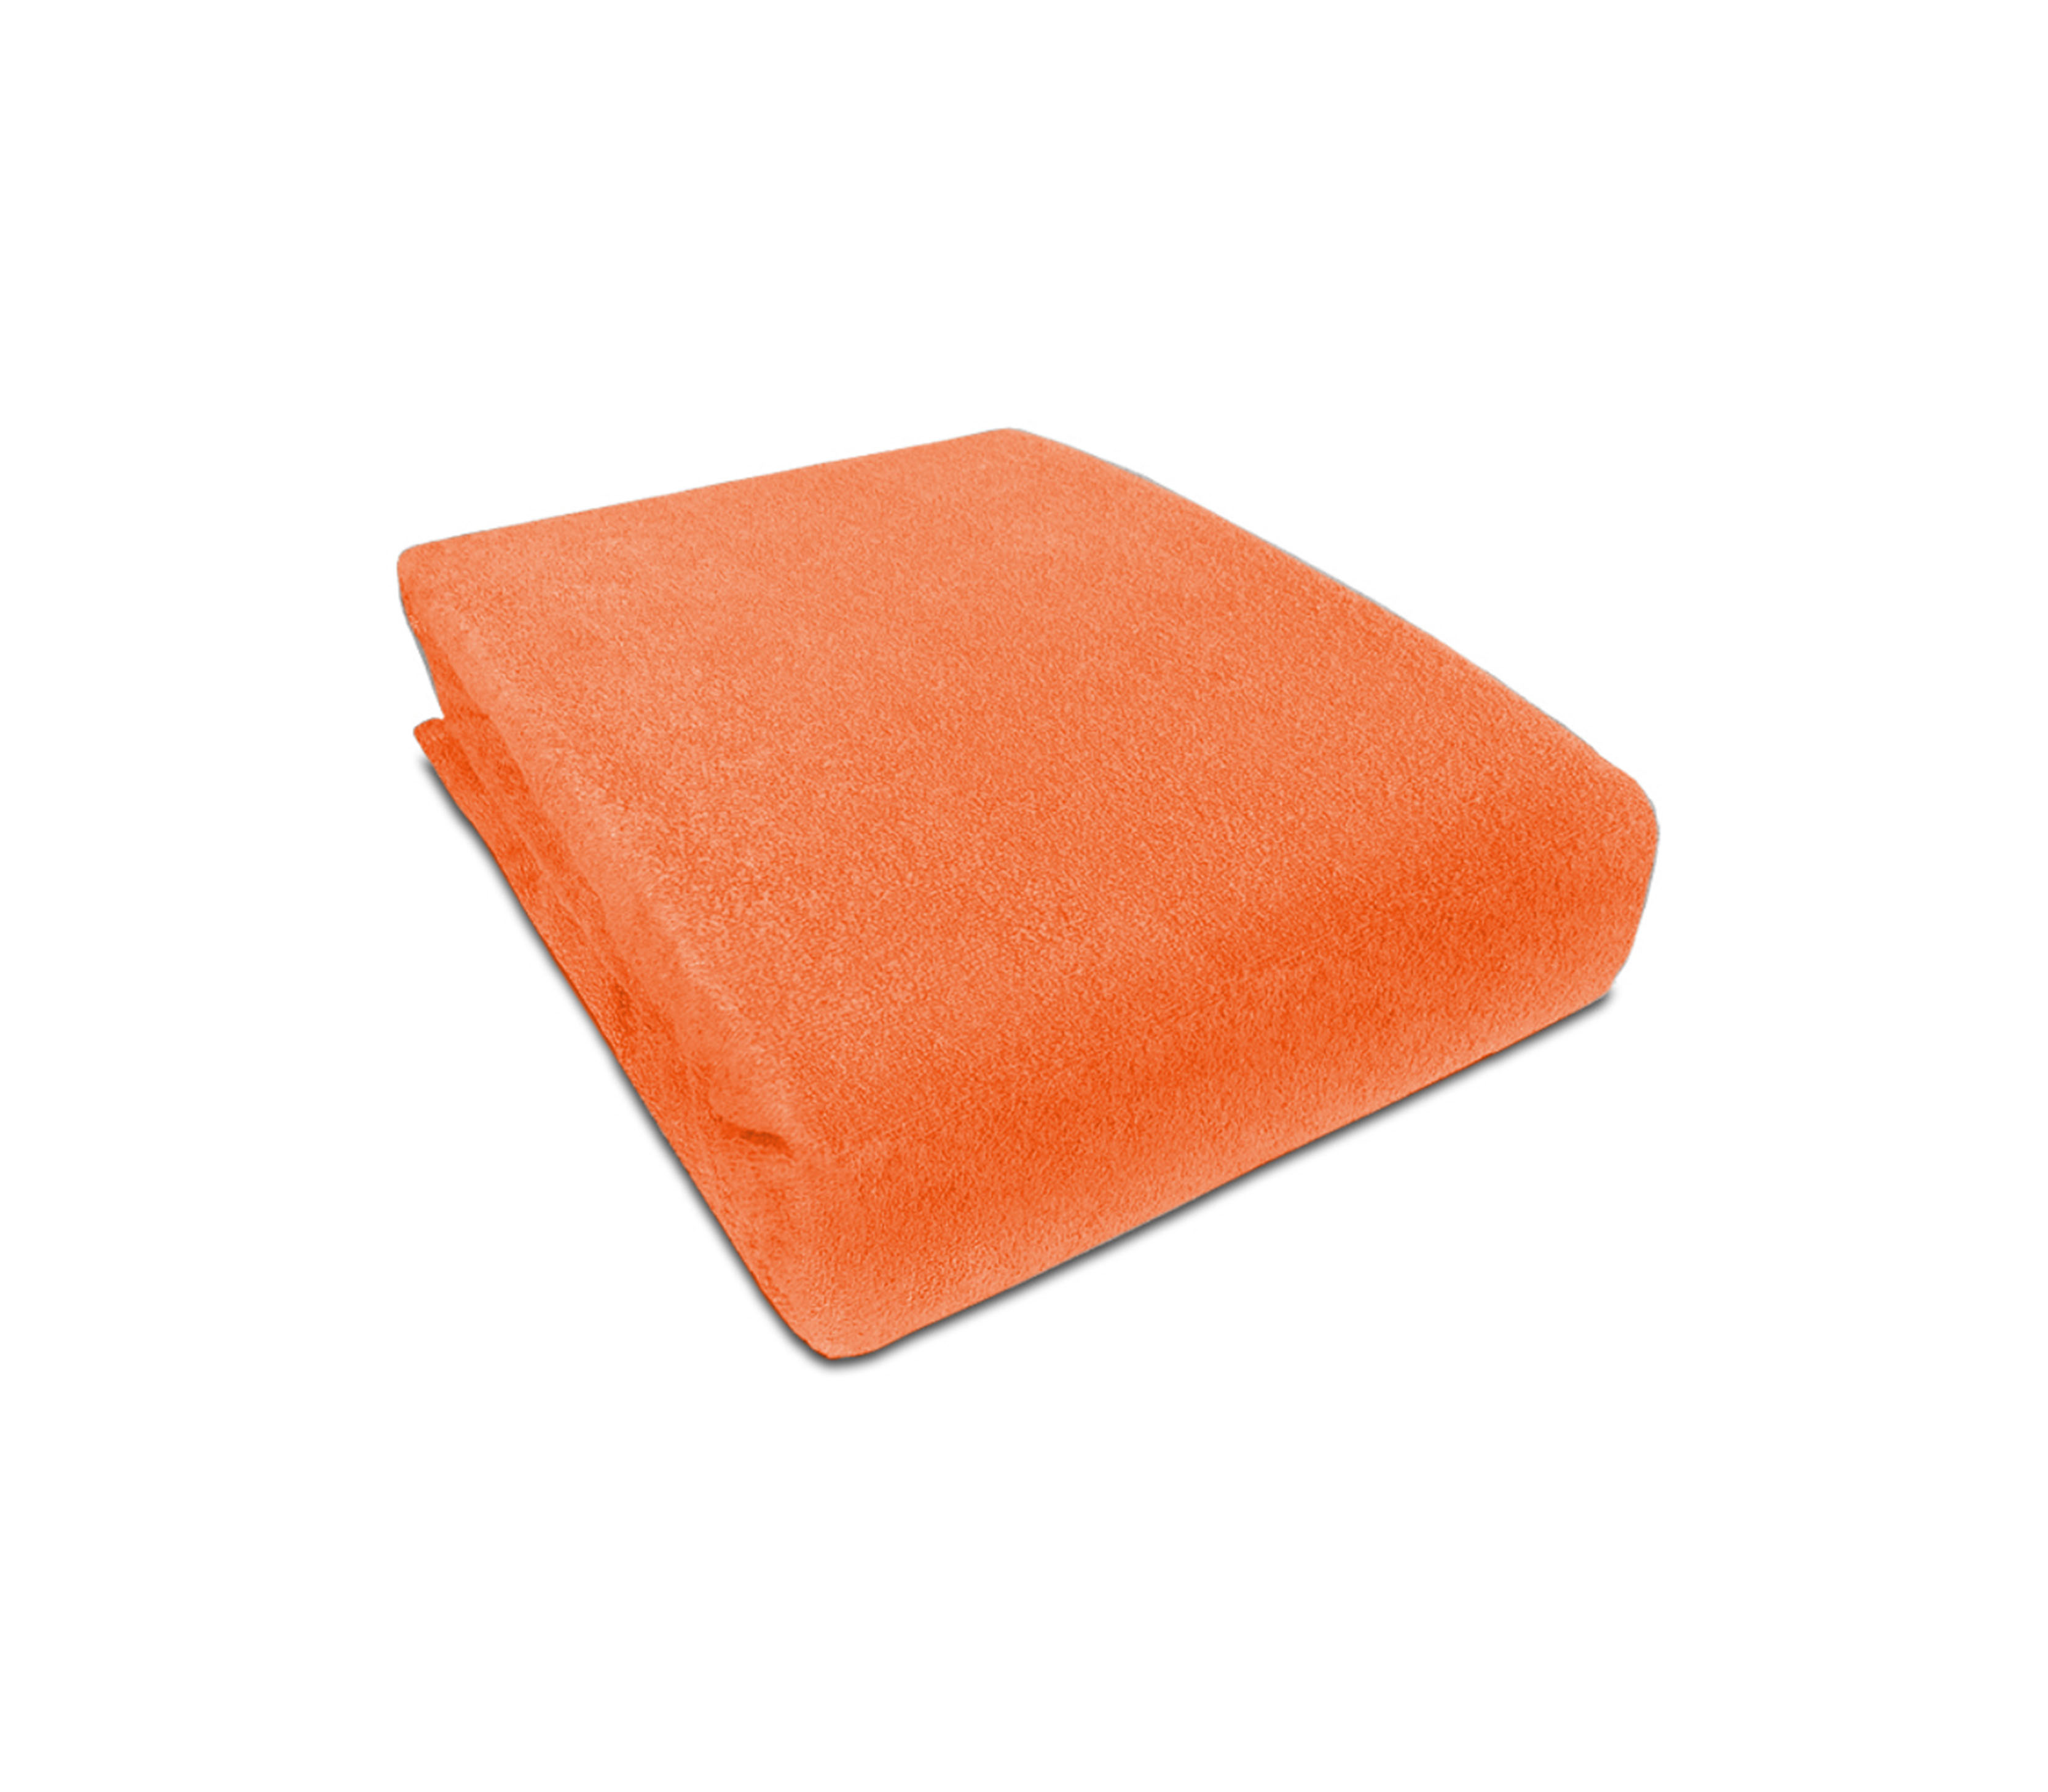 Aga Prostěradlo FROTÉ 90x200 cm Barva prostěradla: Oranžová